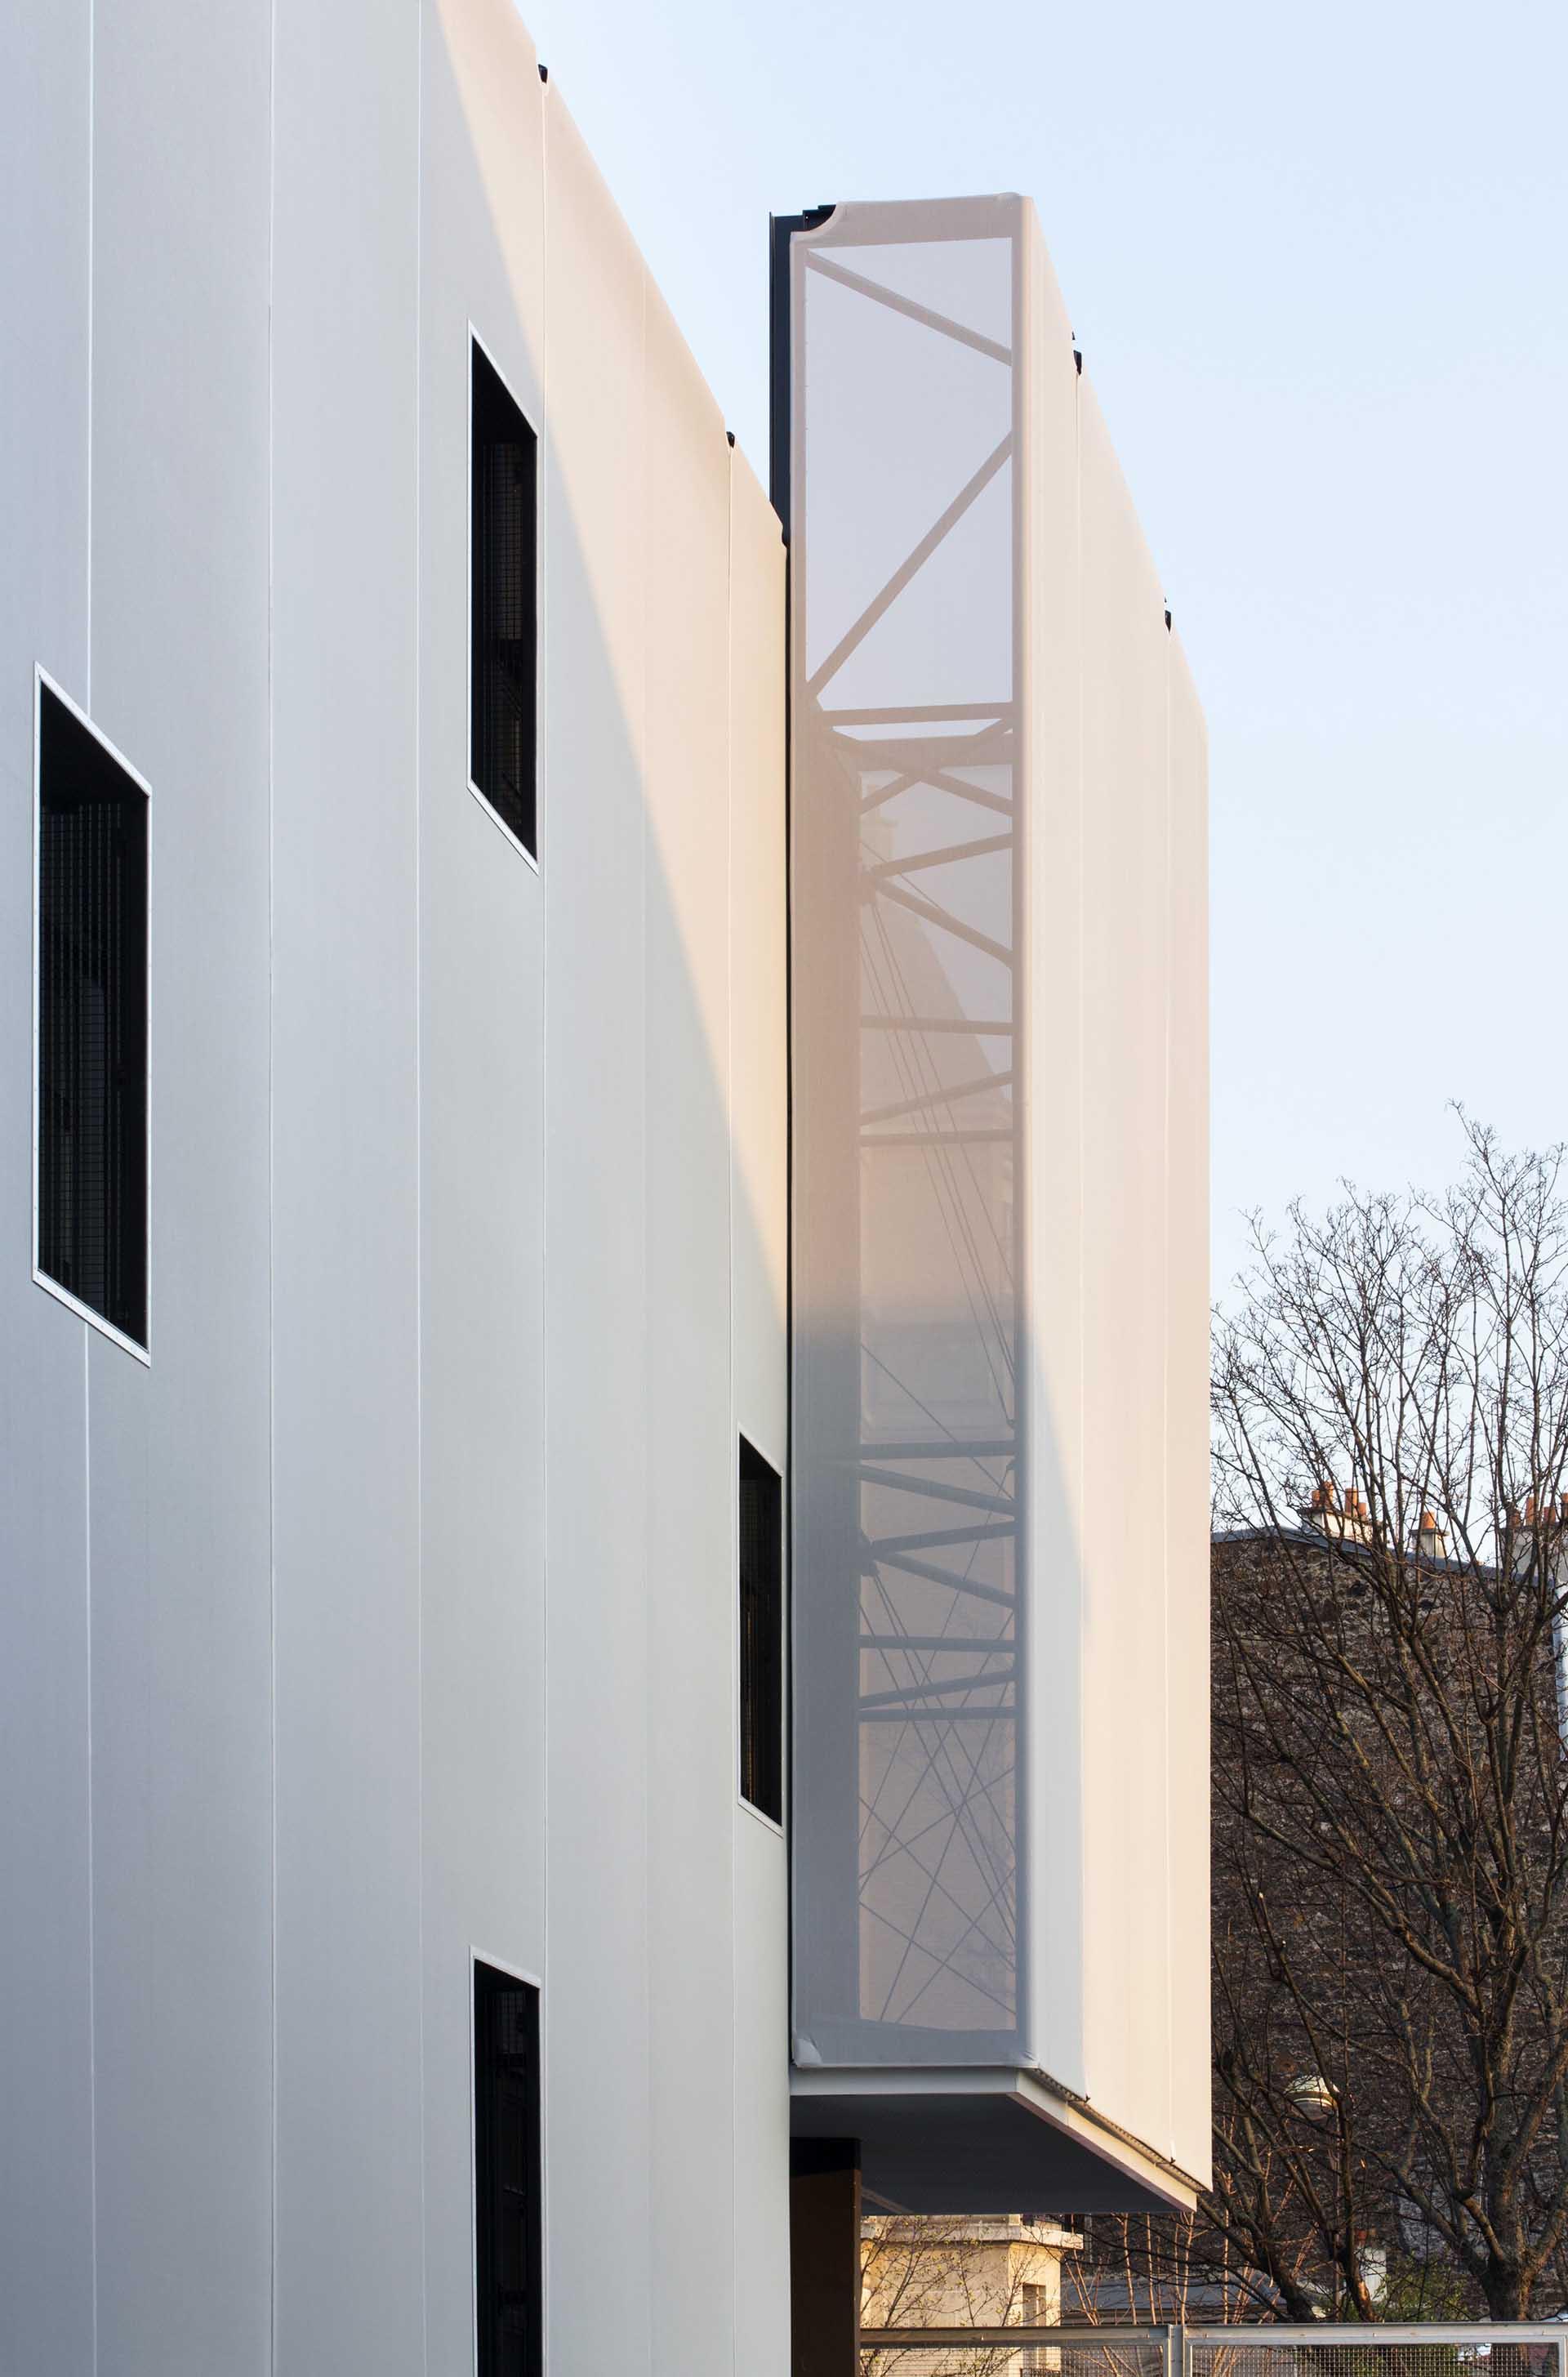 Ecole 42 - NOC 42 - AR Studio Architectures - Xavier NIEL - Kwame YAMGNANE - Florian BUCHER - Nicolas SADIRAC - Free - Reinventer Paris (7).jpg